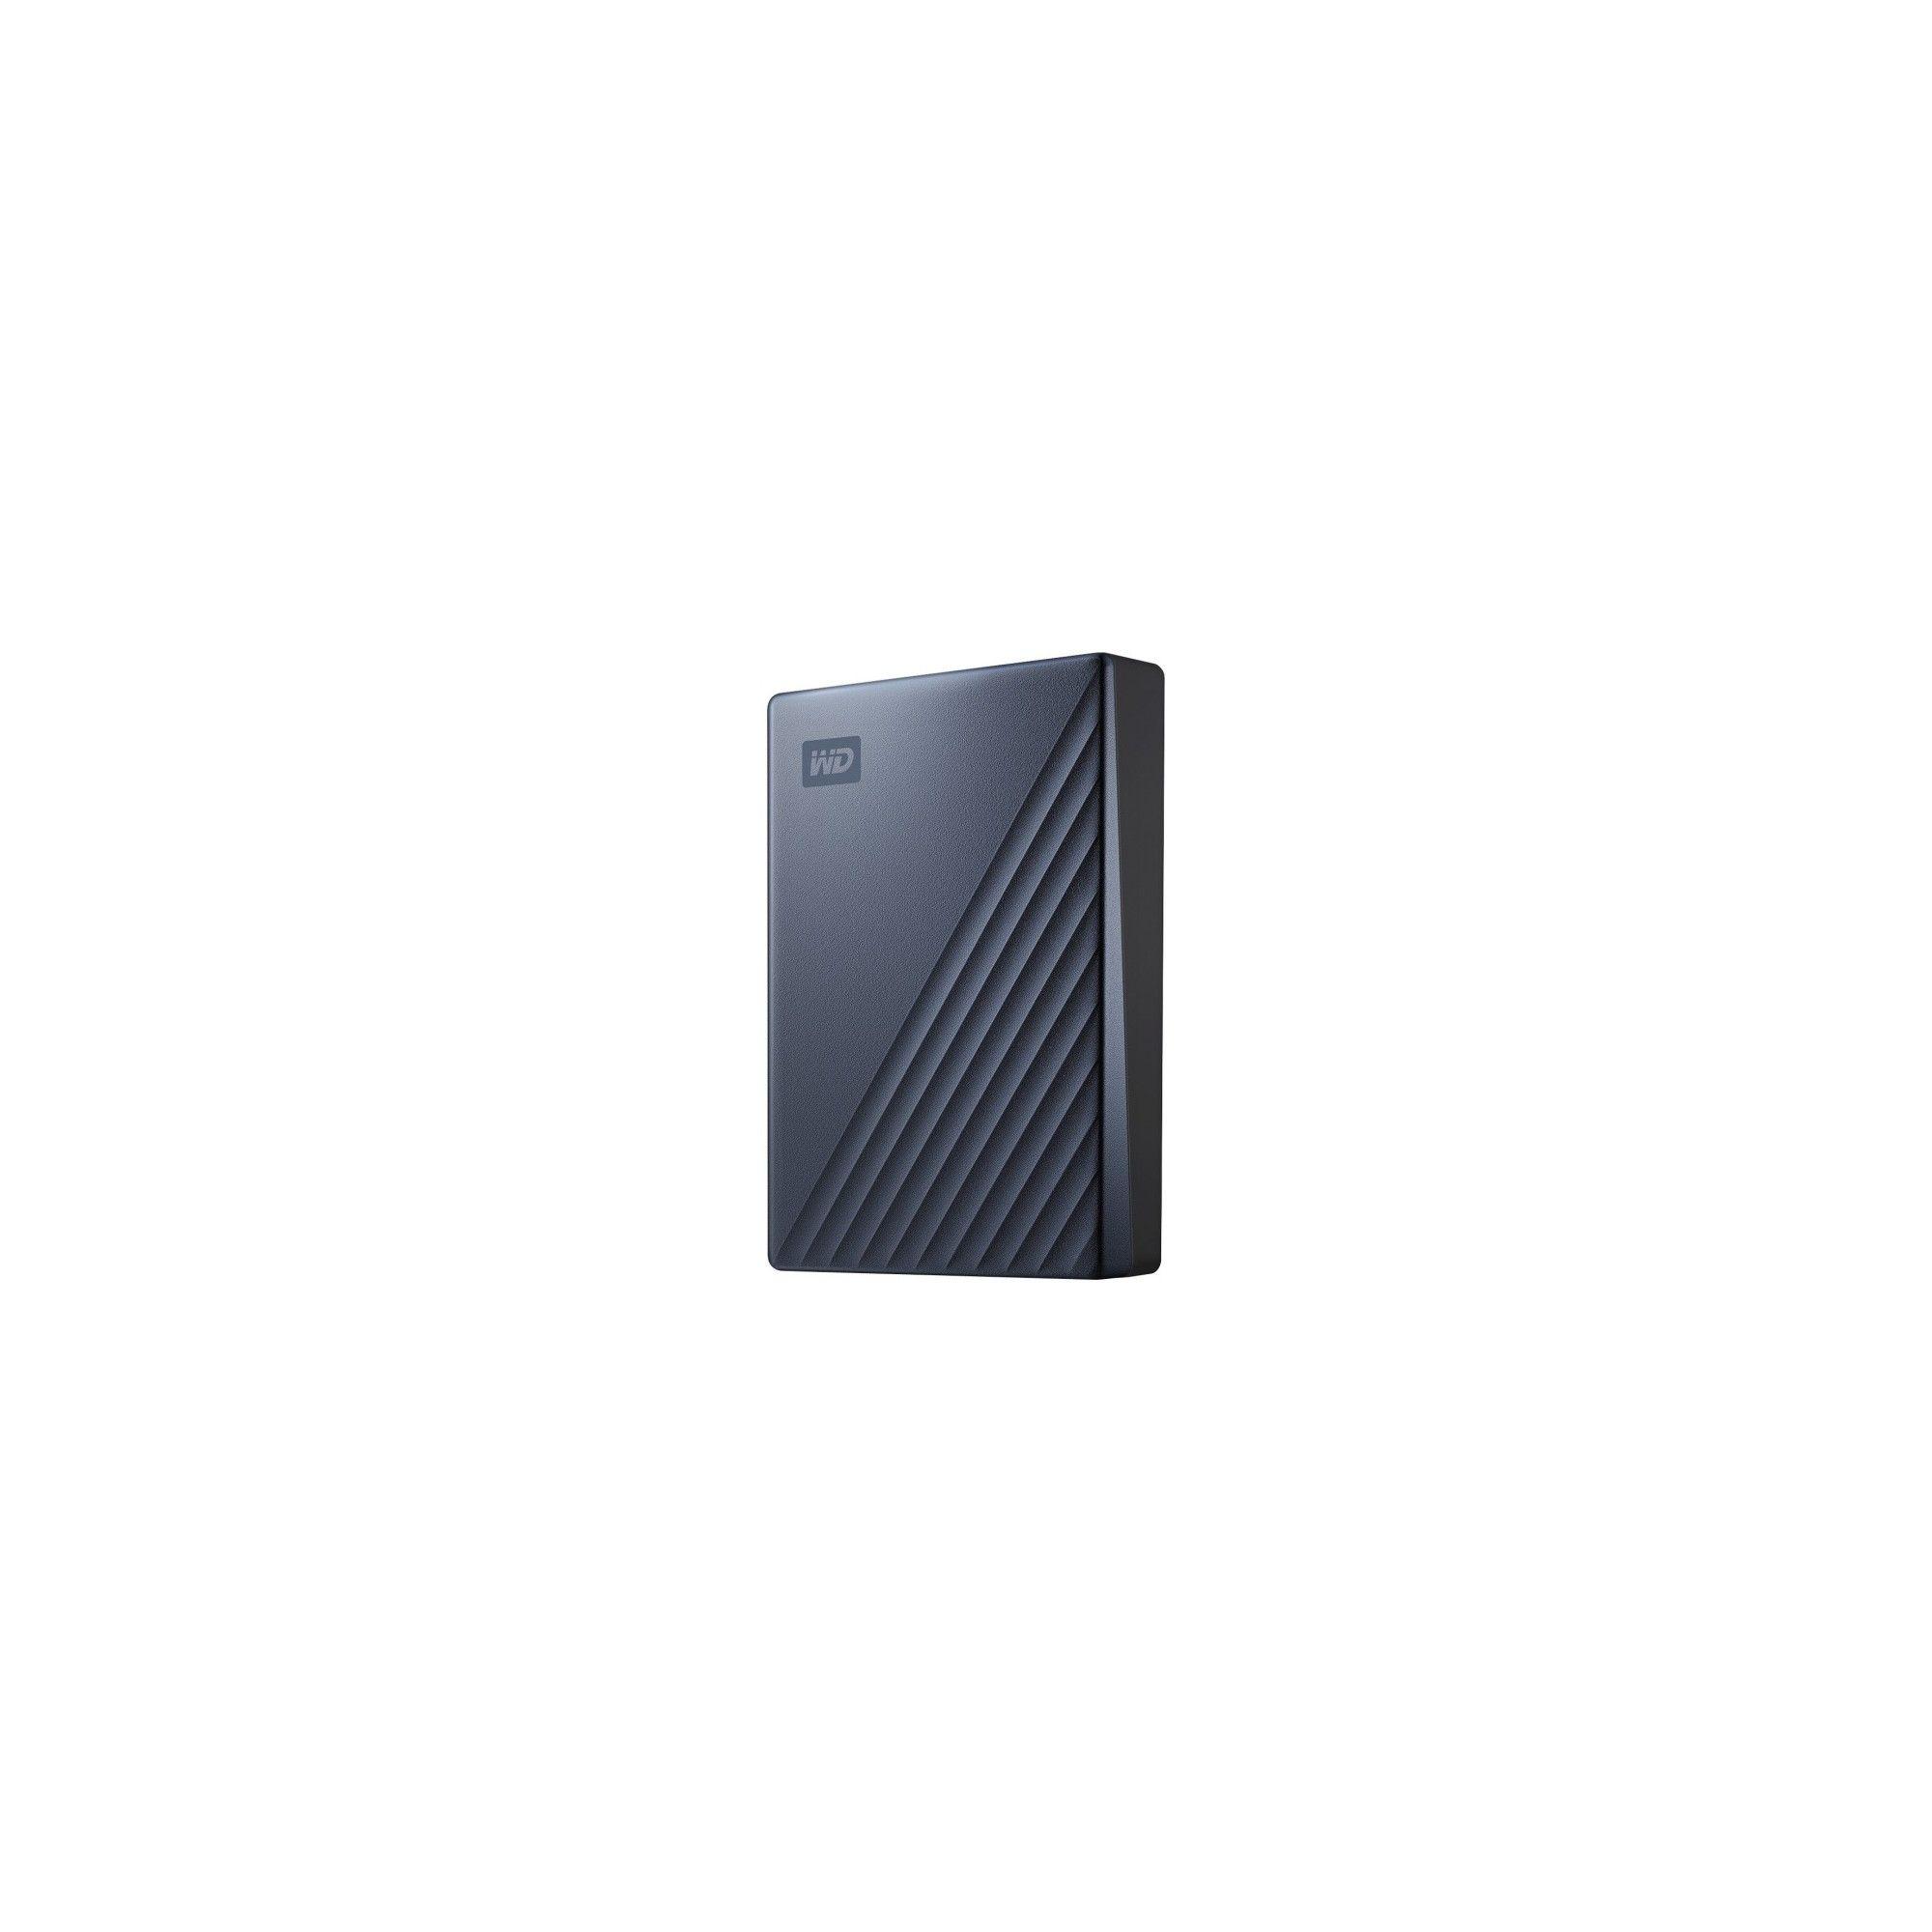 Wd My Passport Ultra Wdbftm0040bbl 4 Tb Hard Drive External Portable Usb 3 0 Blue 256 Bit Encryption Standard Hard Drive Encryption Usb